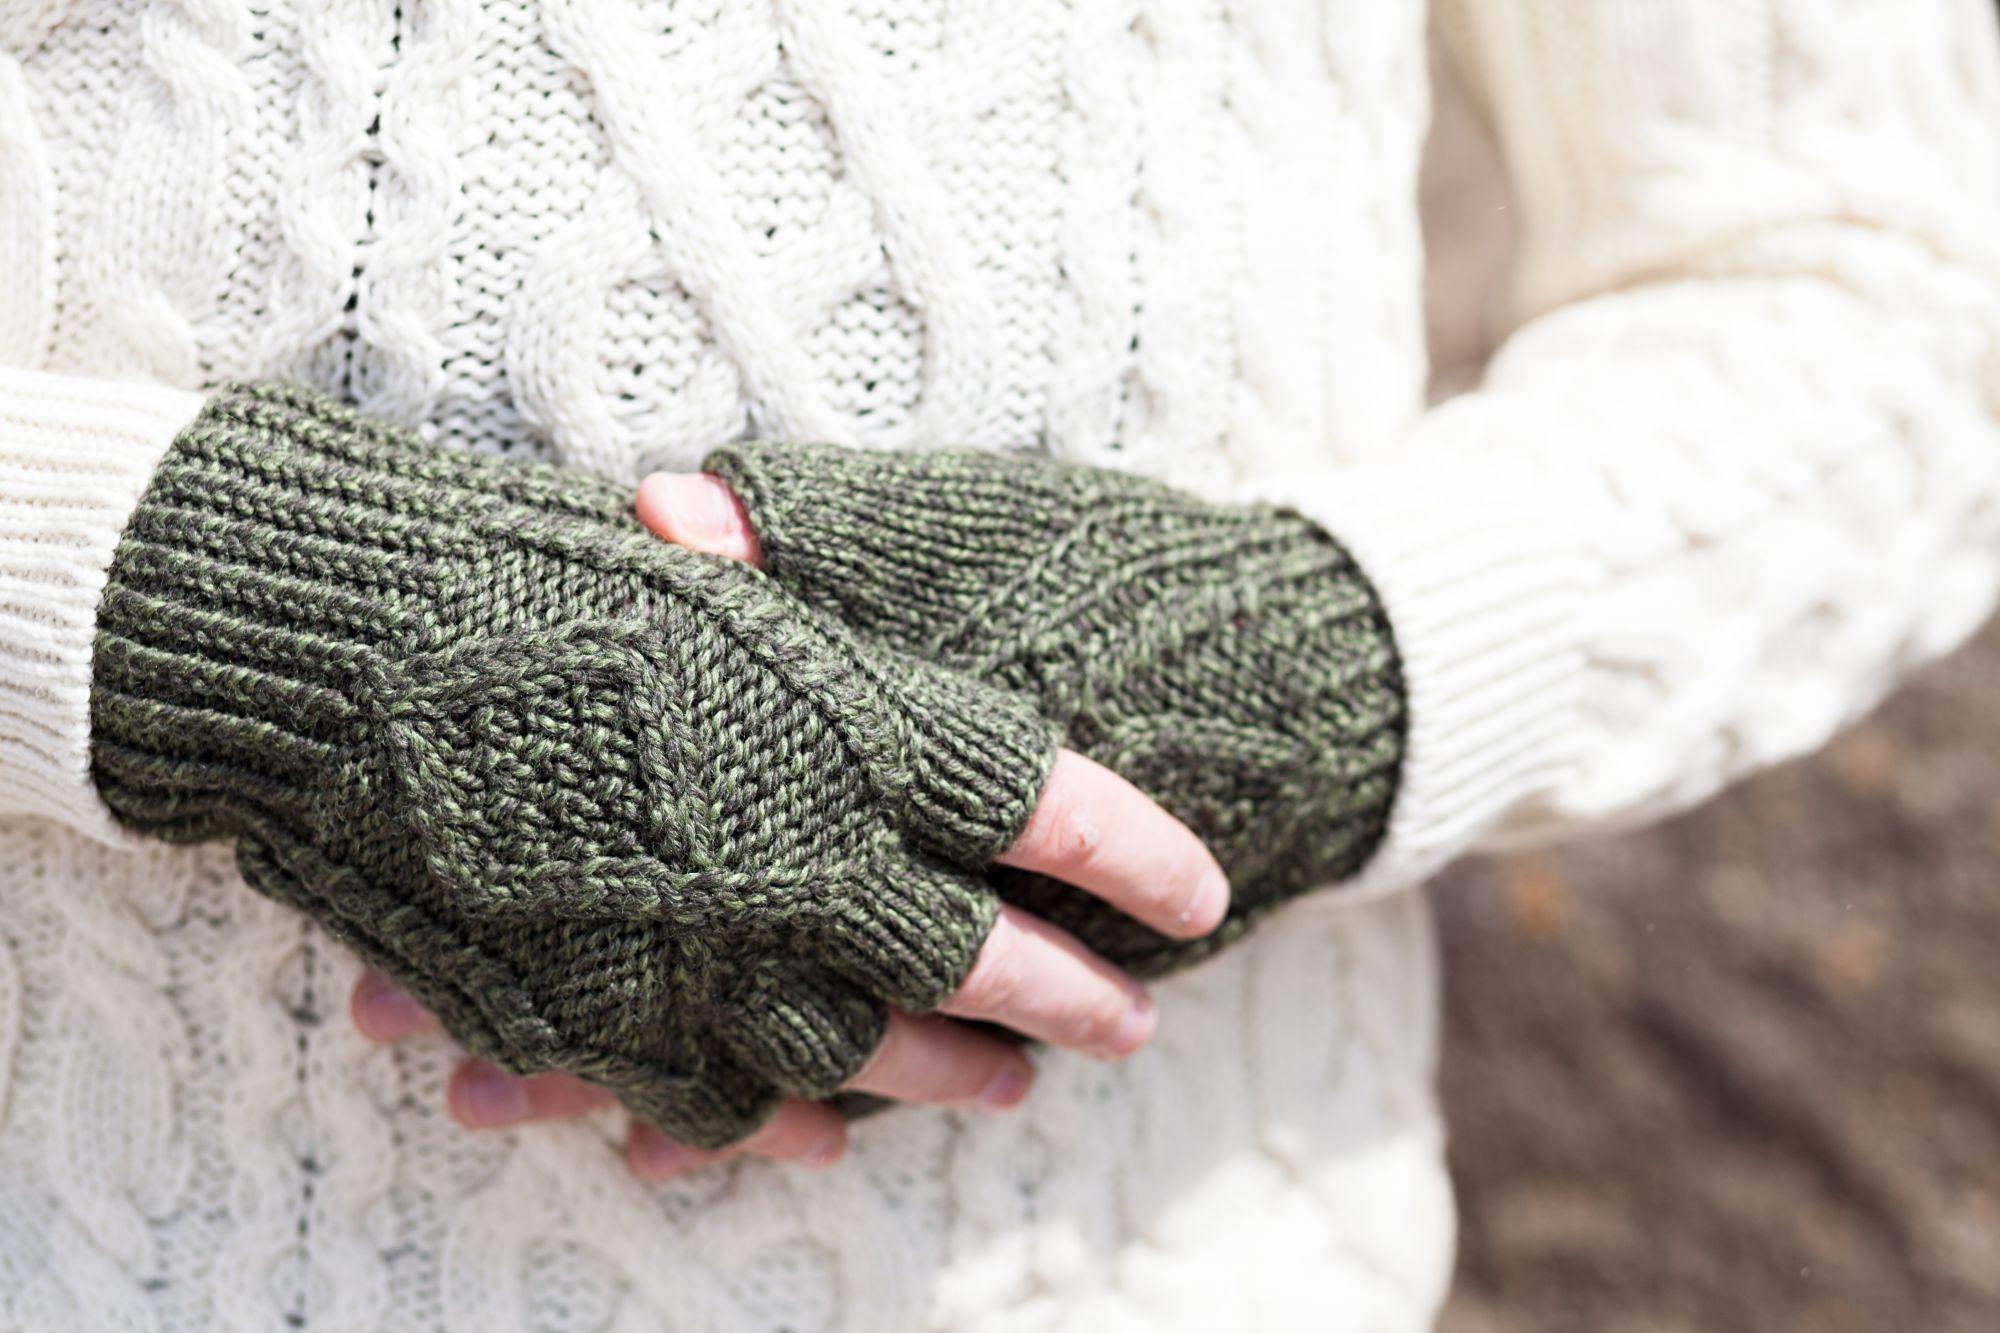 Hand Knit Fingerless Gloves - Aran Islands Knitwear